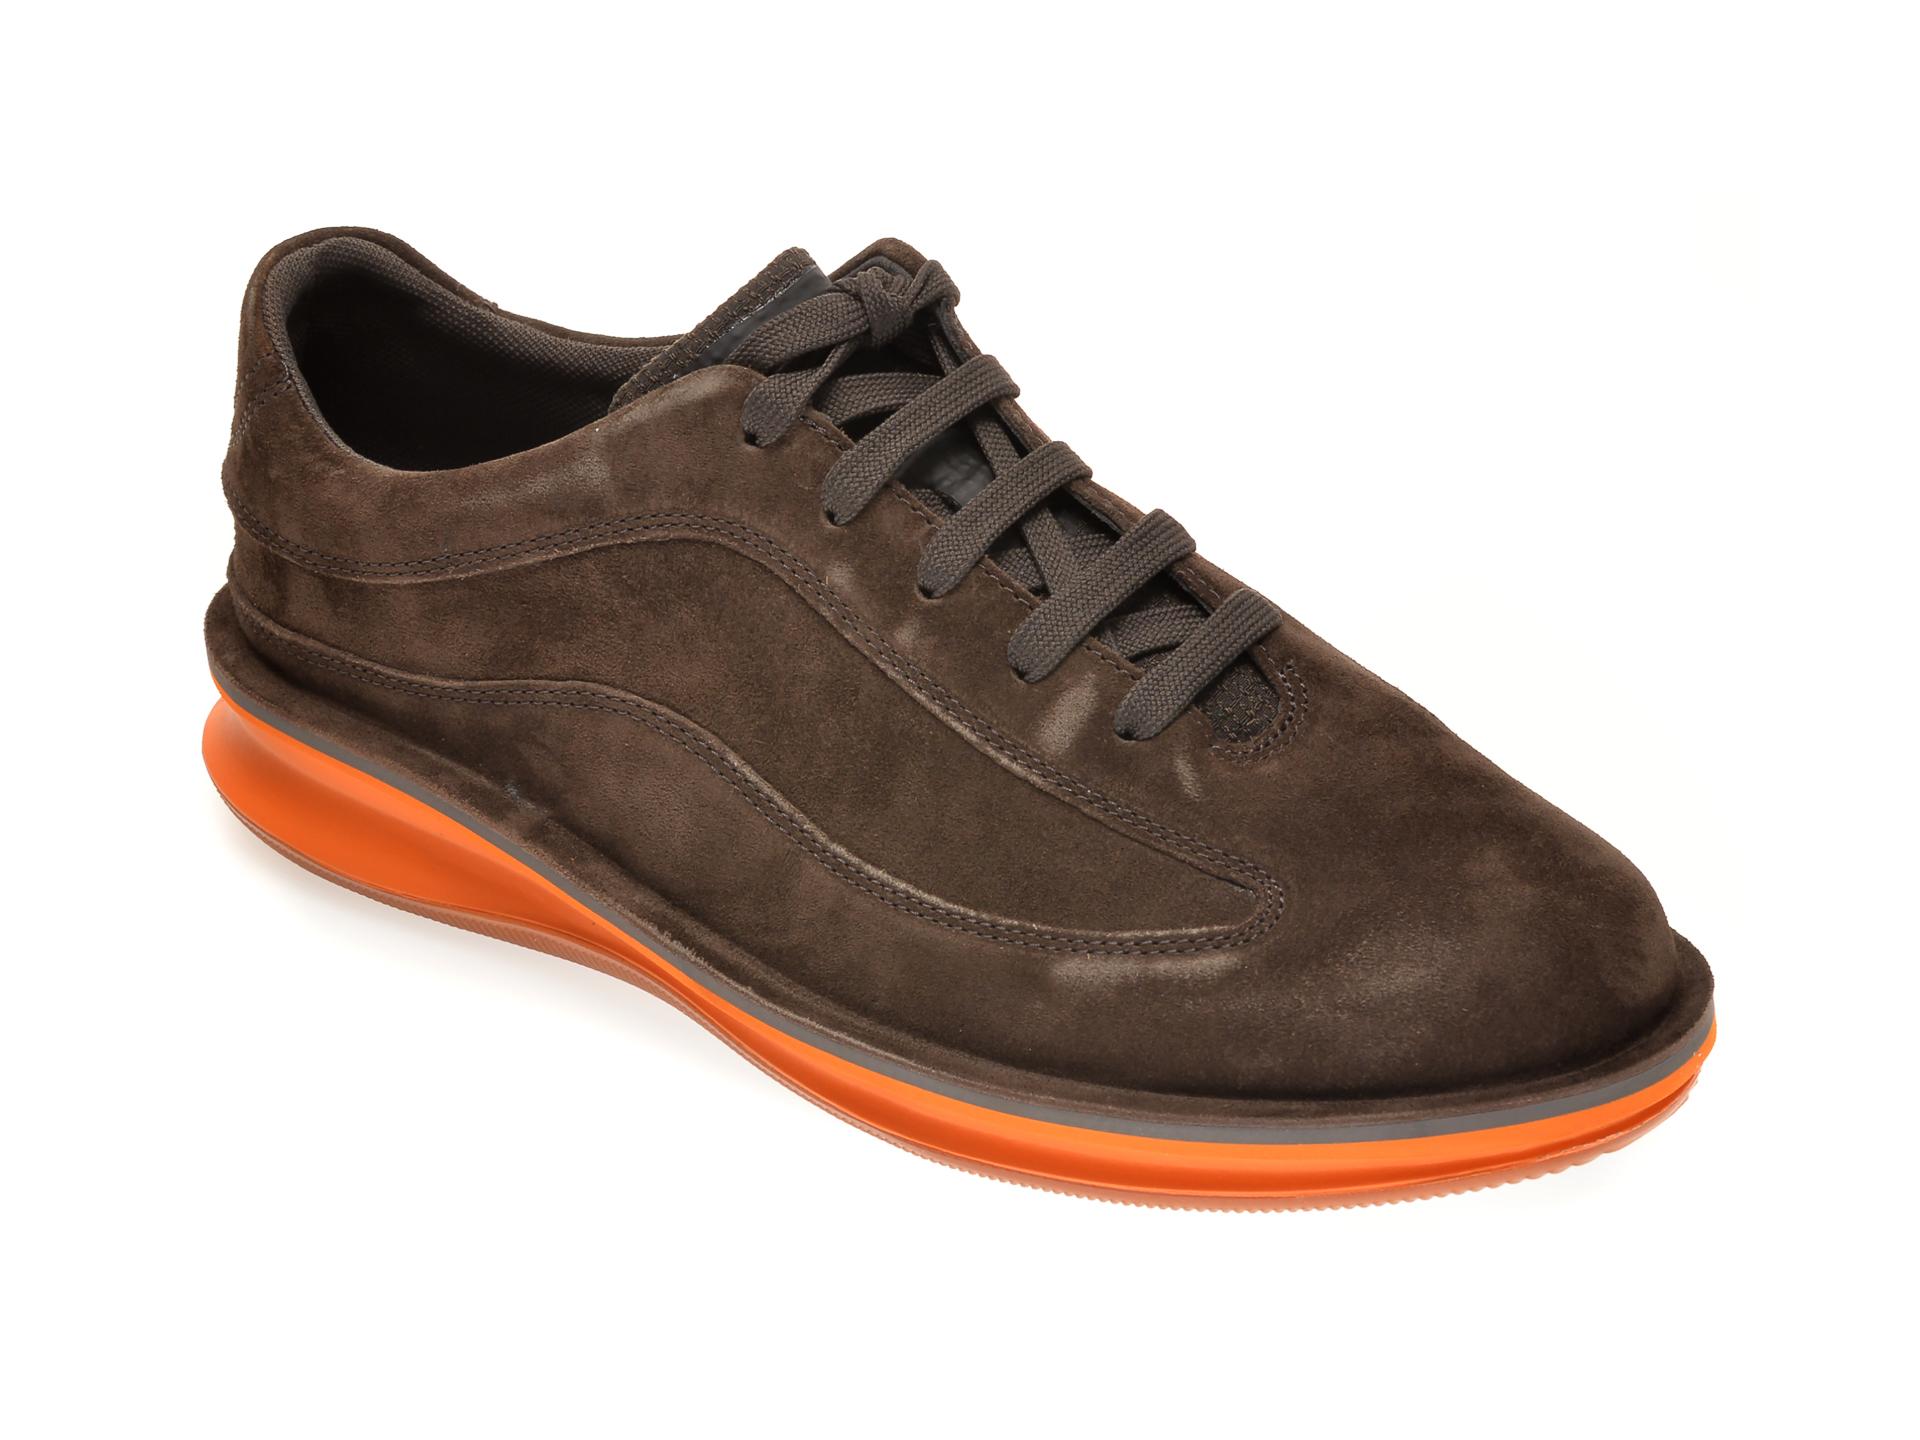 Pantofi CAMPER maro, K100390, din piele intoarsa